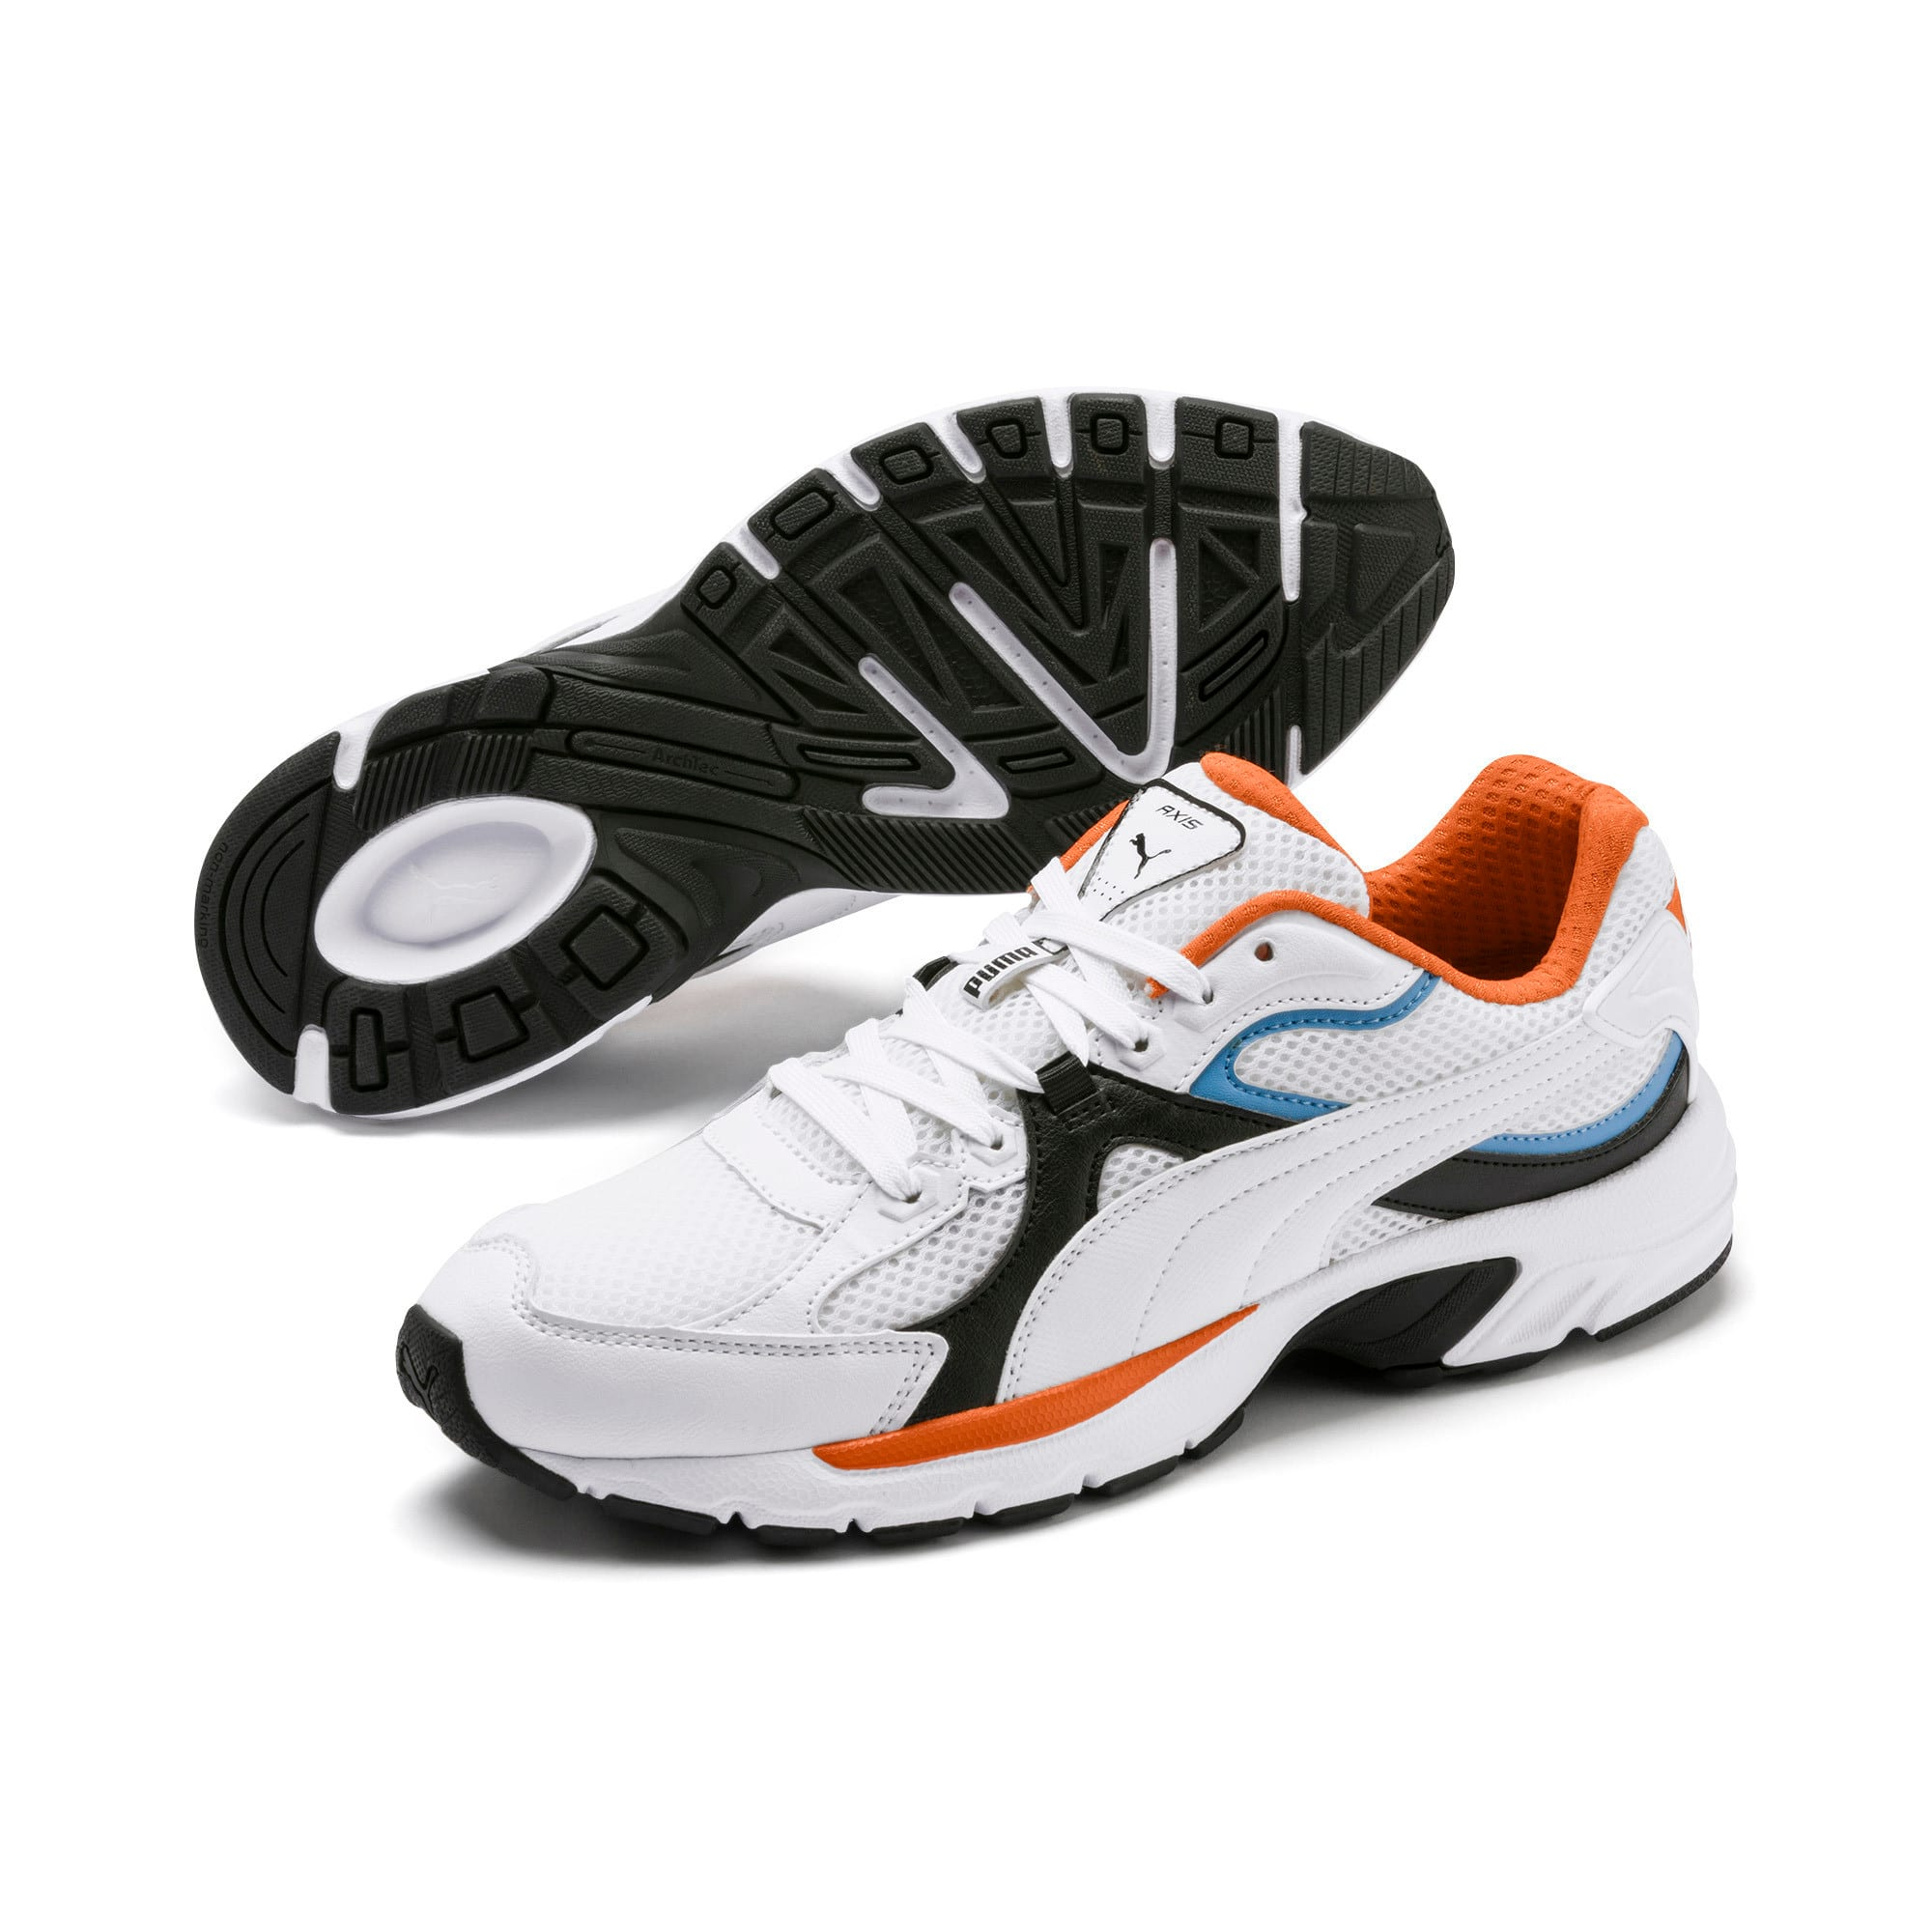 Thumbnail 3 of Axis Plus 90s Sneakers, White-Blk-T Lt Blue-J Orange, medium